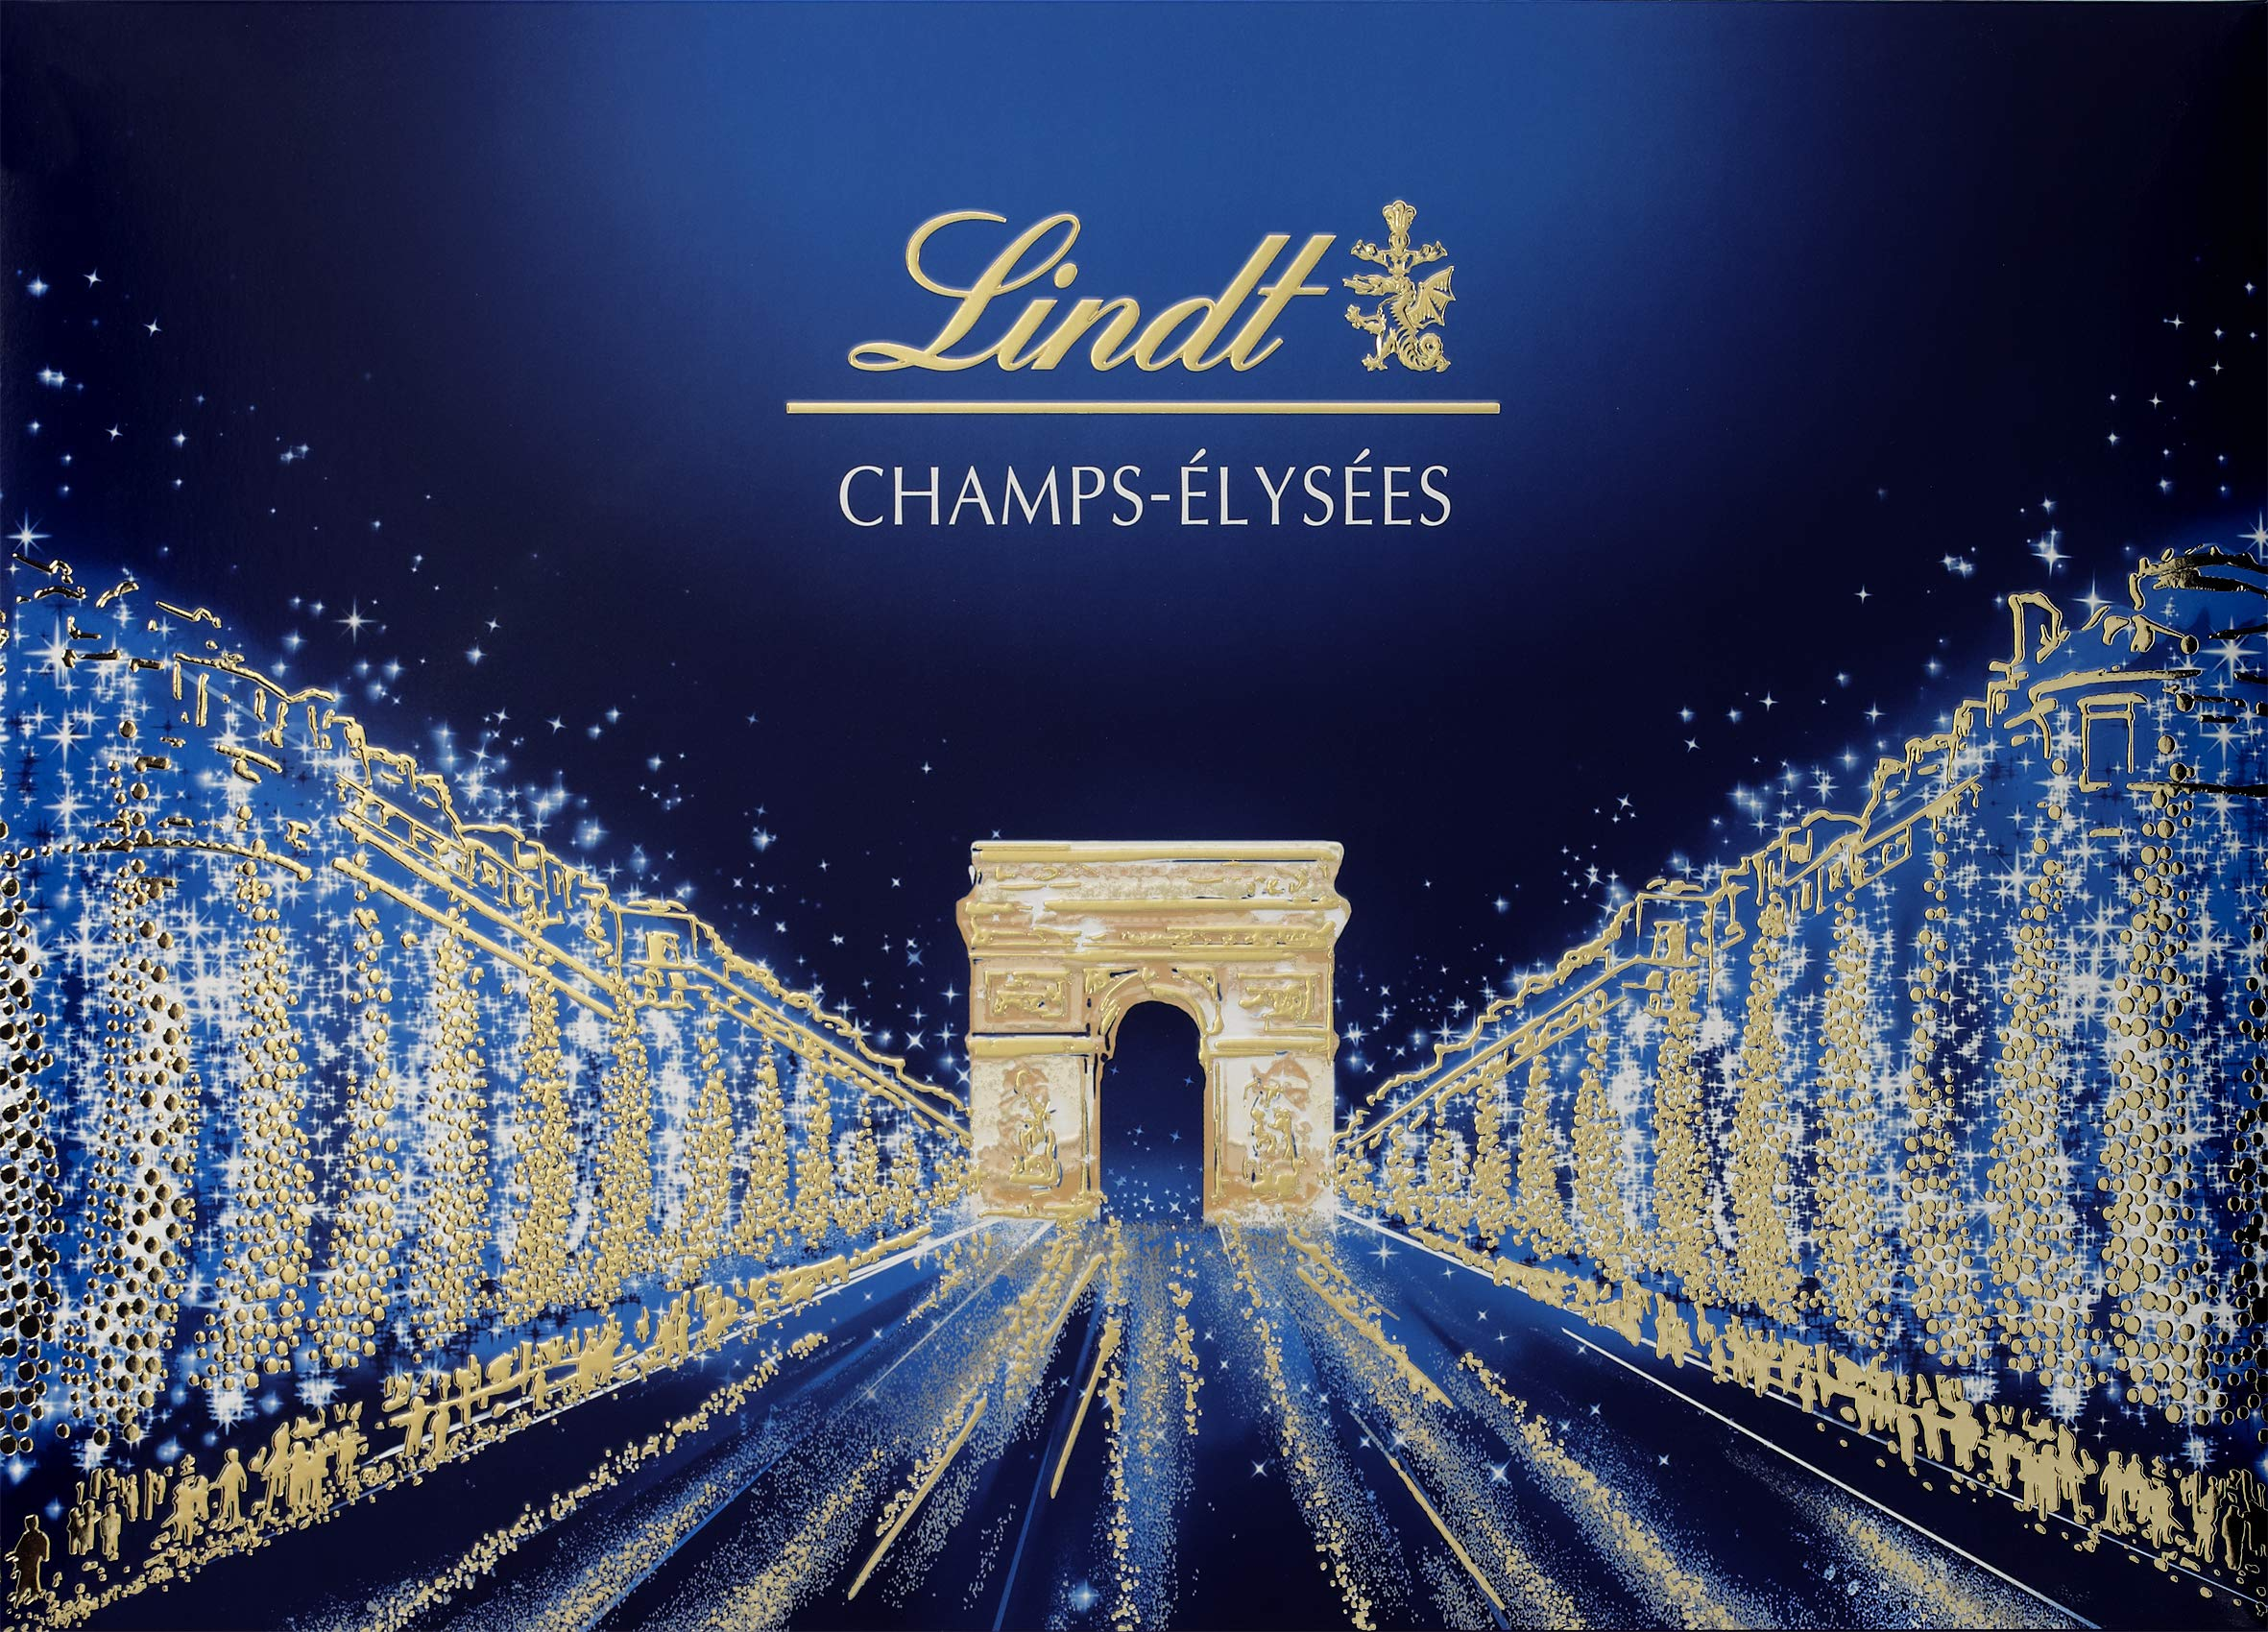 Lindt Champs Elysées Chocolate Box Gourmet Milk and Dark Chocolate Assortment 44 Chocolates 16.5oz by Lindt